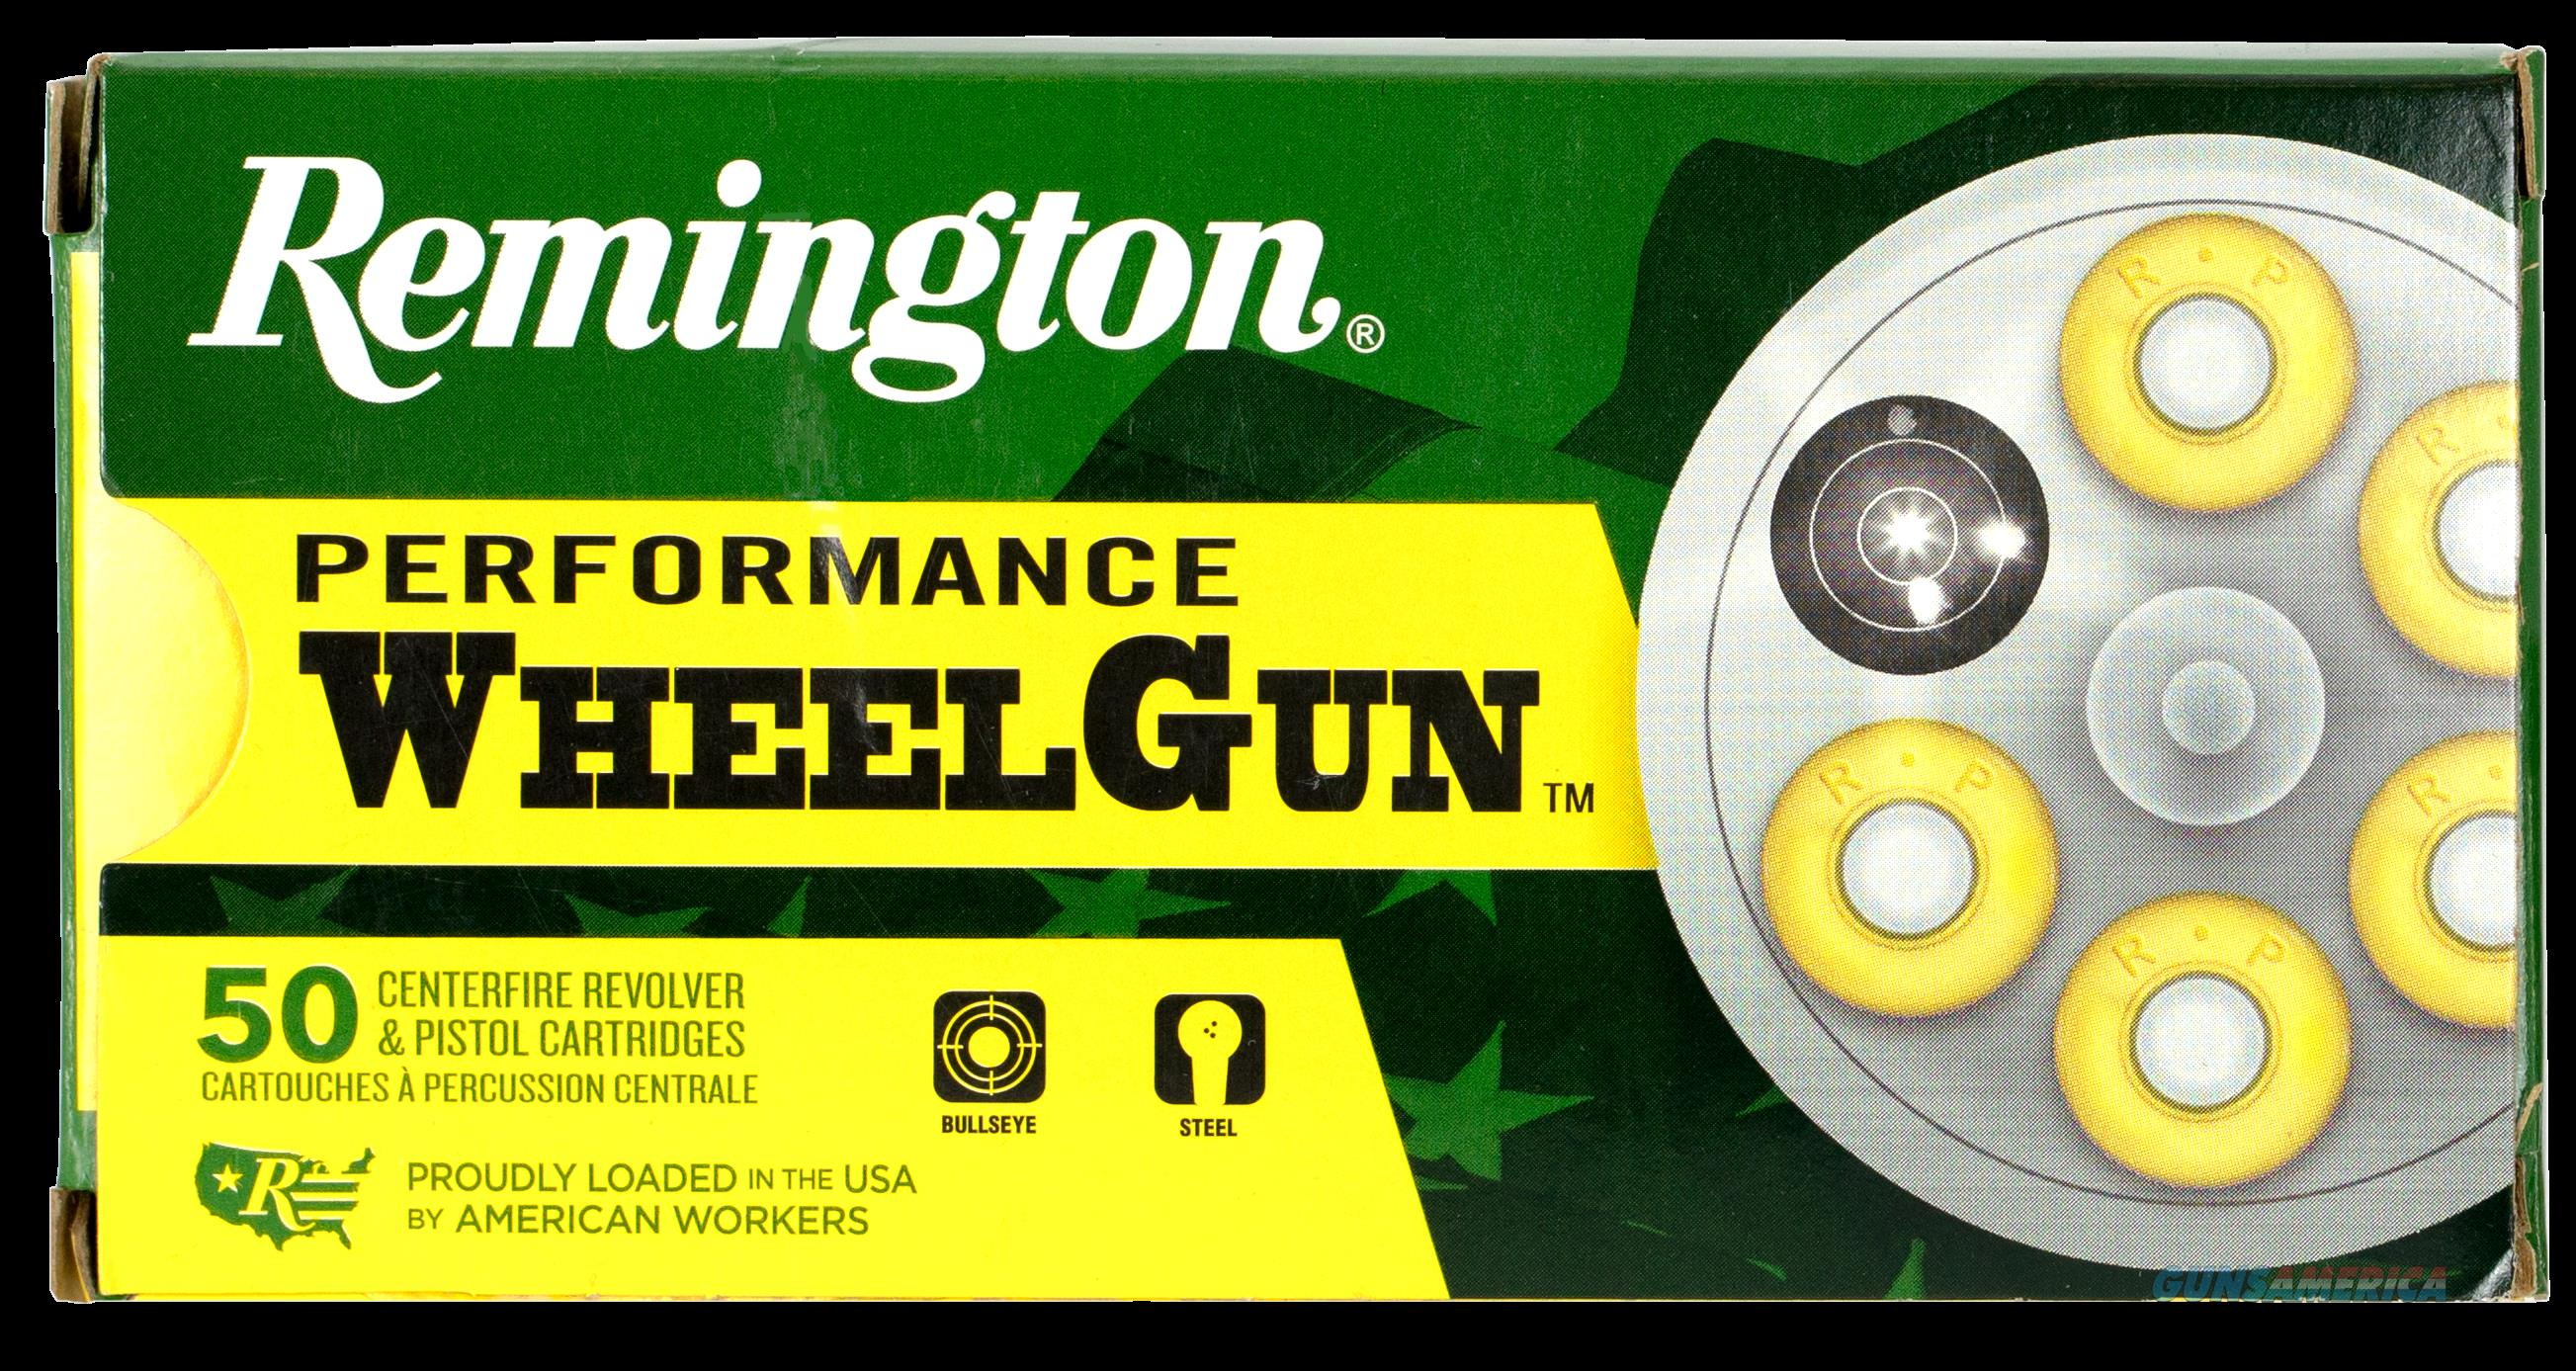 Remington Ammunition Performance Wheelgun, Rem 22281 Rpw38s5  Wheelgun 38sp 158 Lrn  50-10  Guns > Pistols > 1911 Pistol Copies (non-Colt)